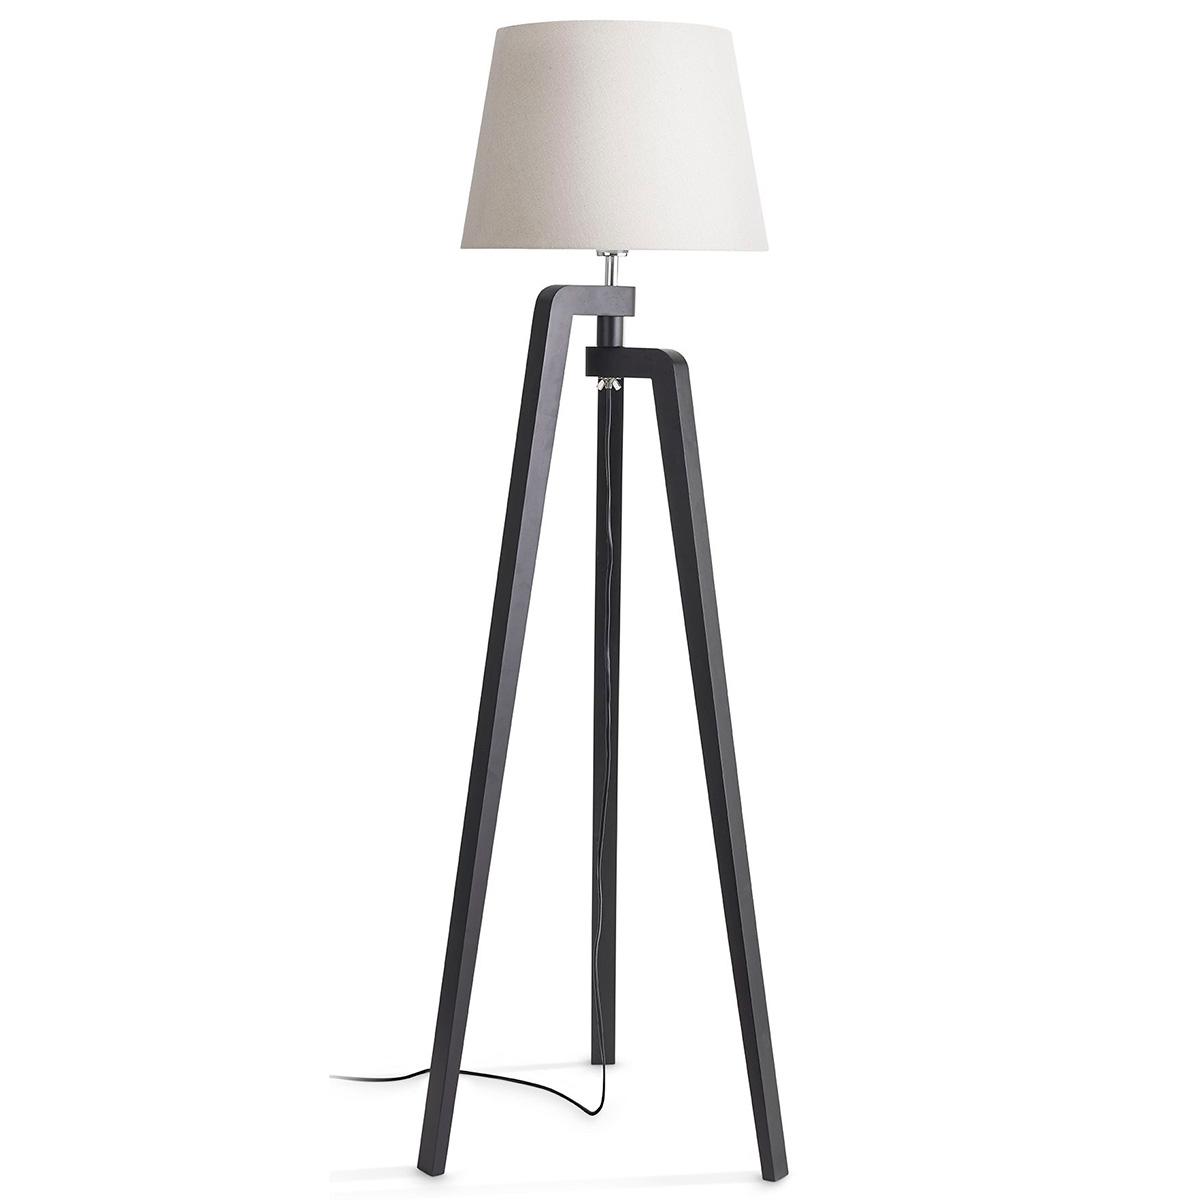 Philips myLiving gulvlampe - Gilbert - Sort/hvid